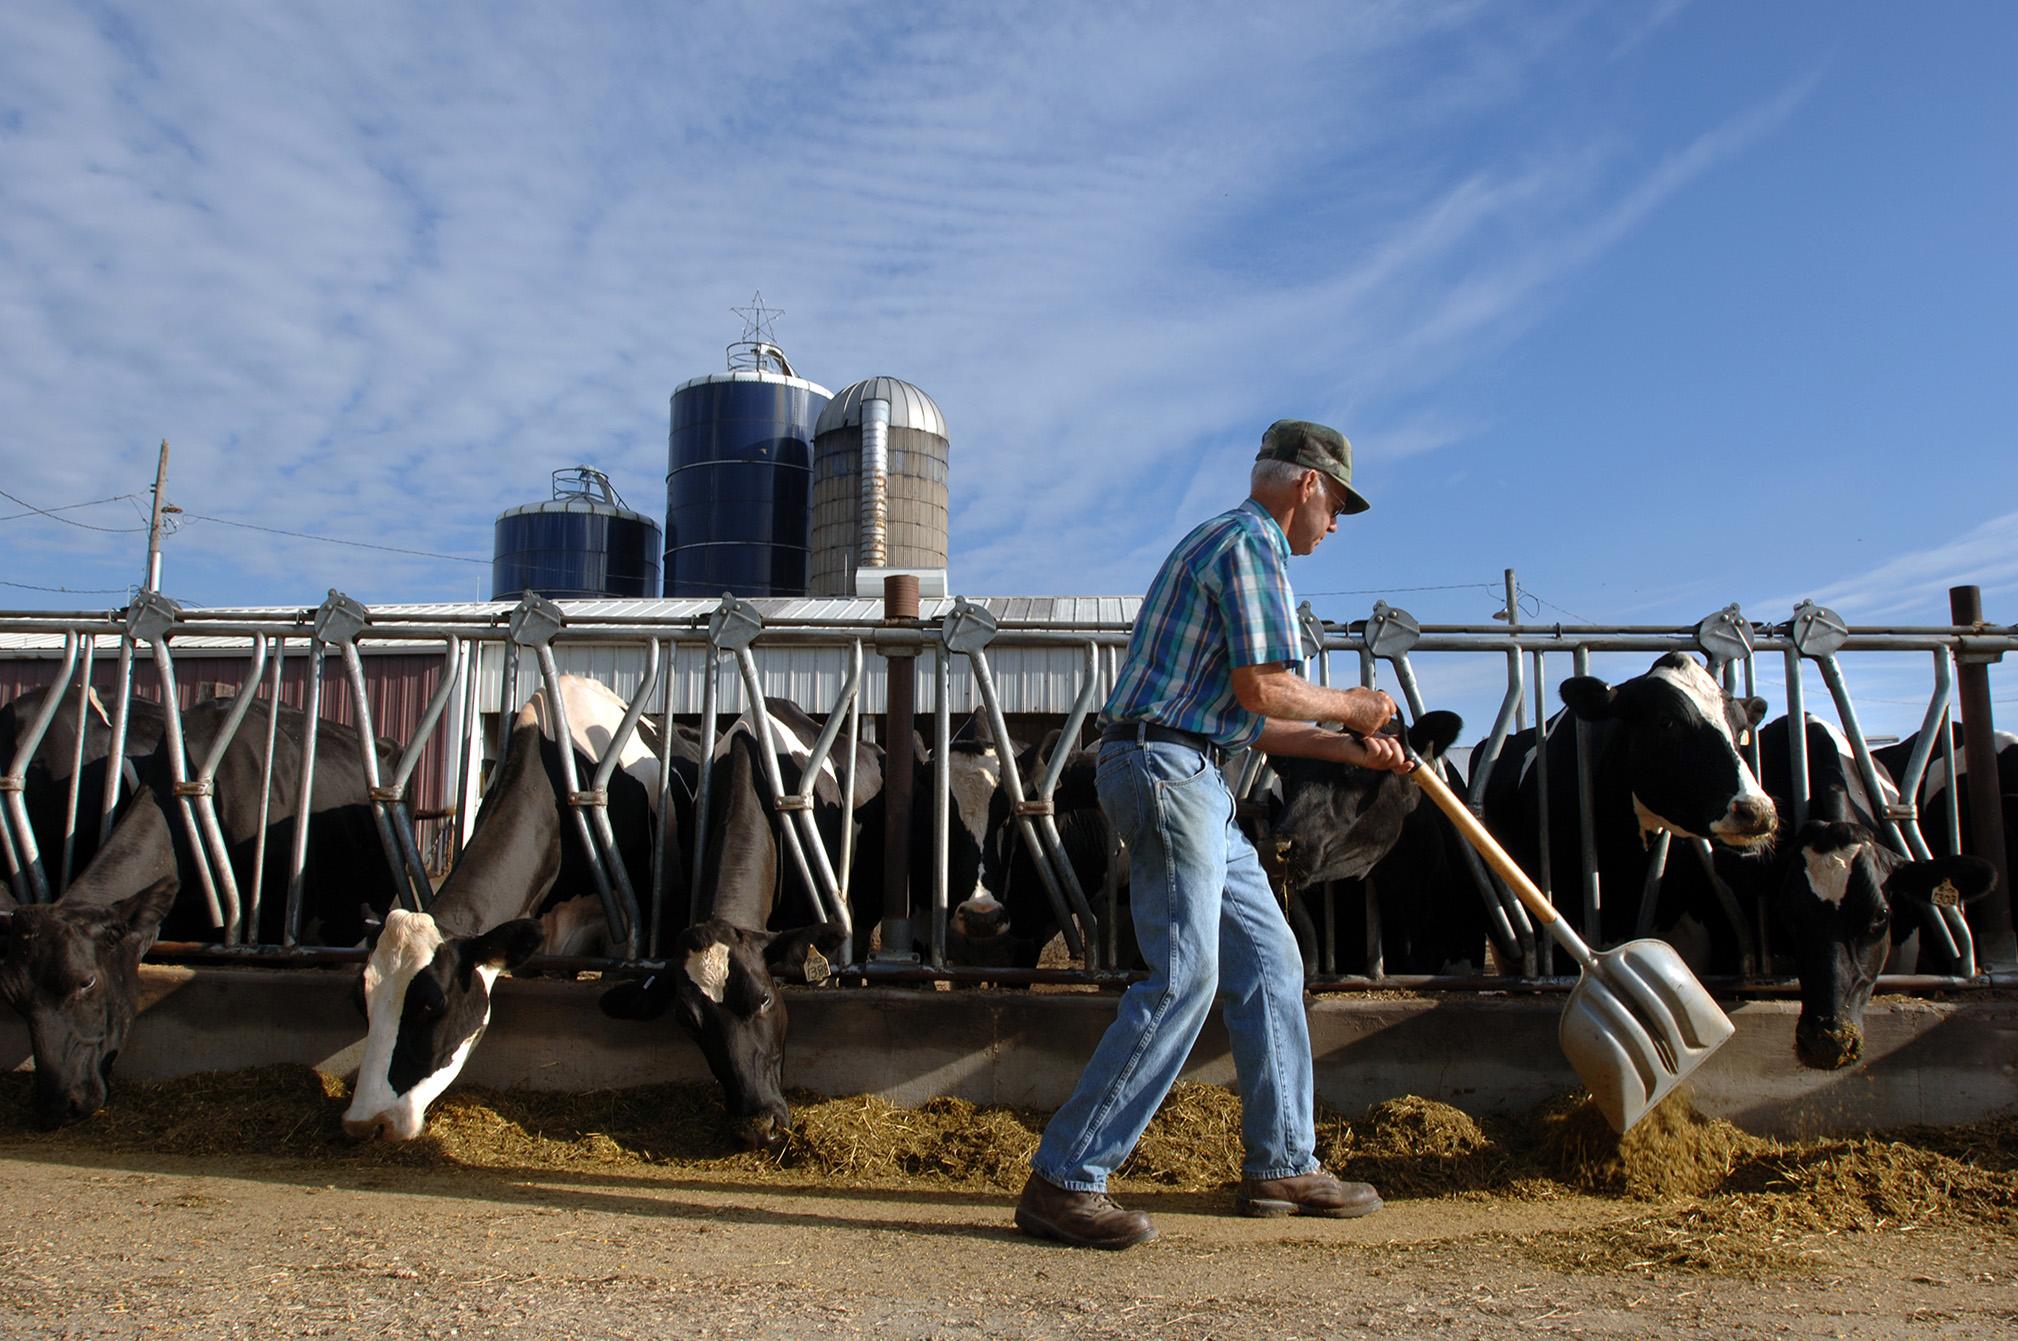 USA, Iowa, Burlington, senior male farmer feeding dairy cows